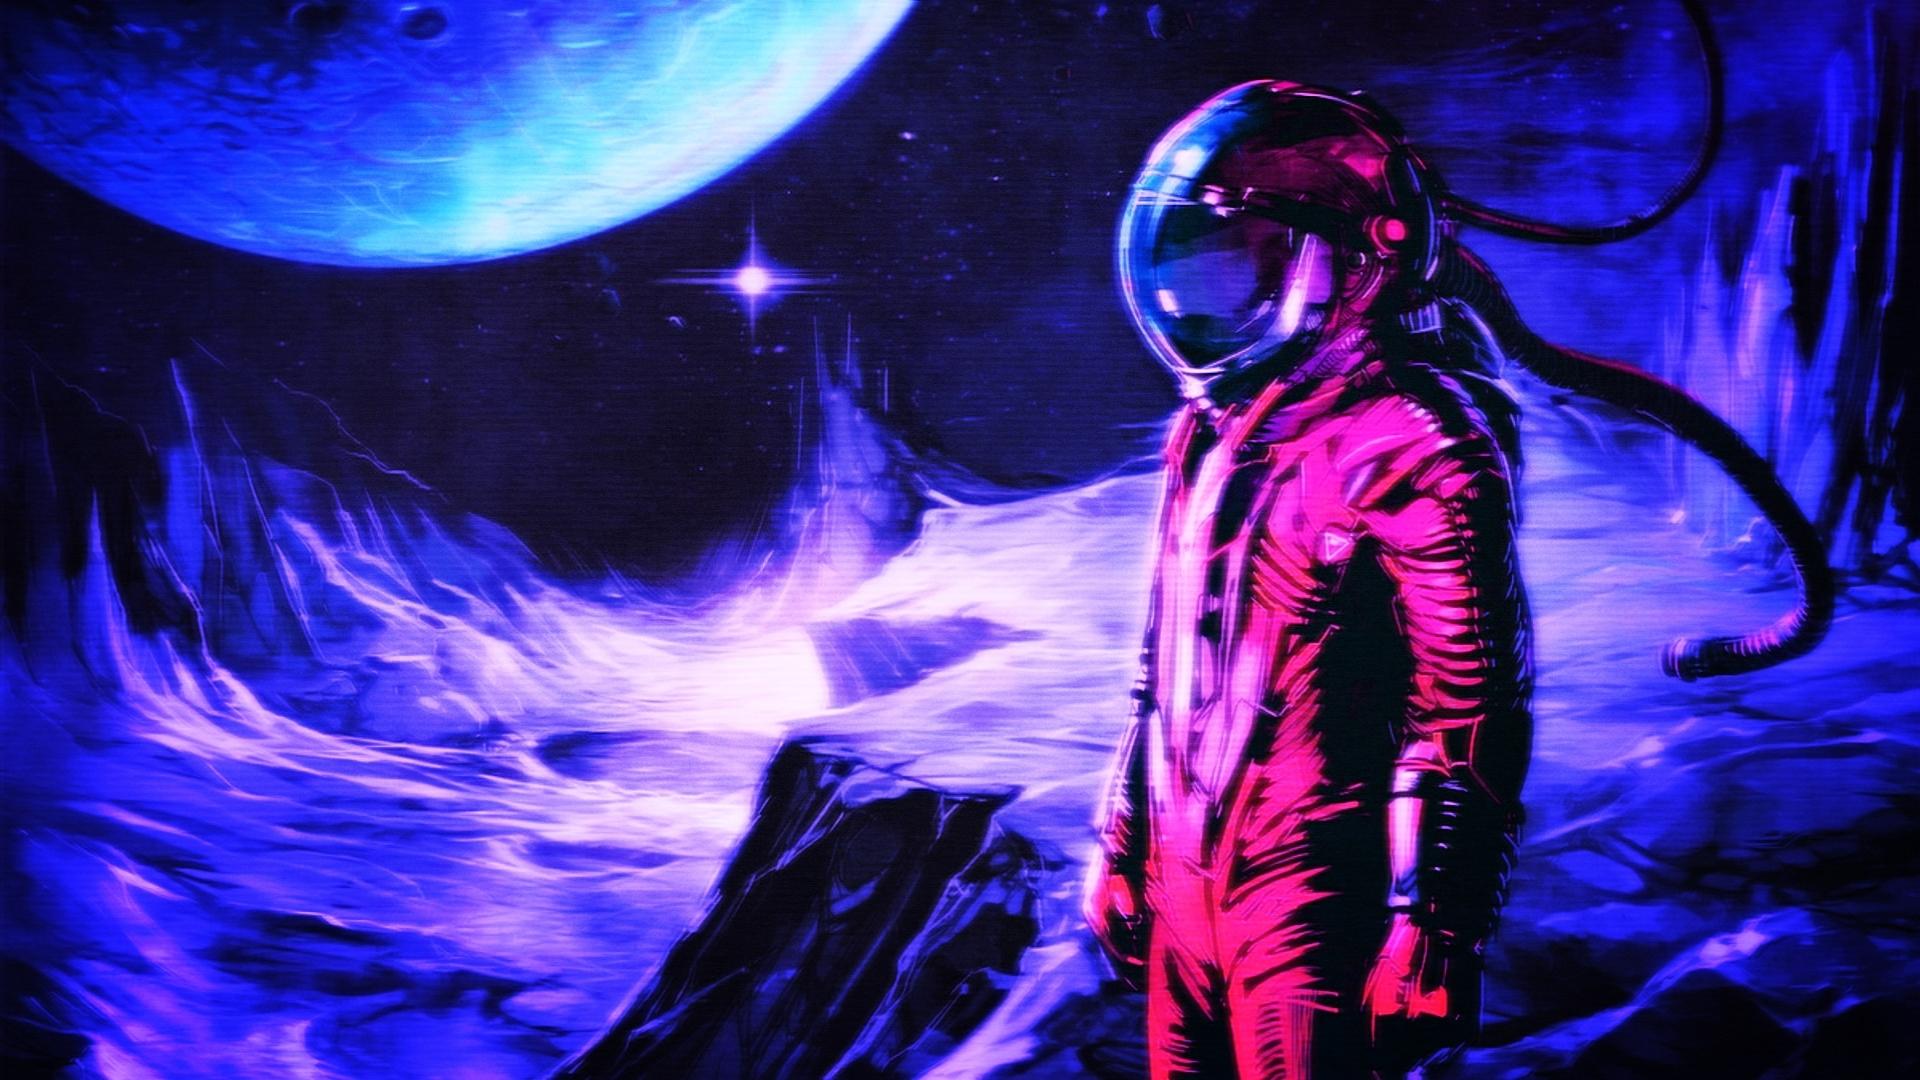 Wallpaper Astronaut, retro style, digital art